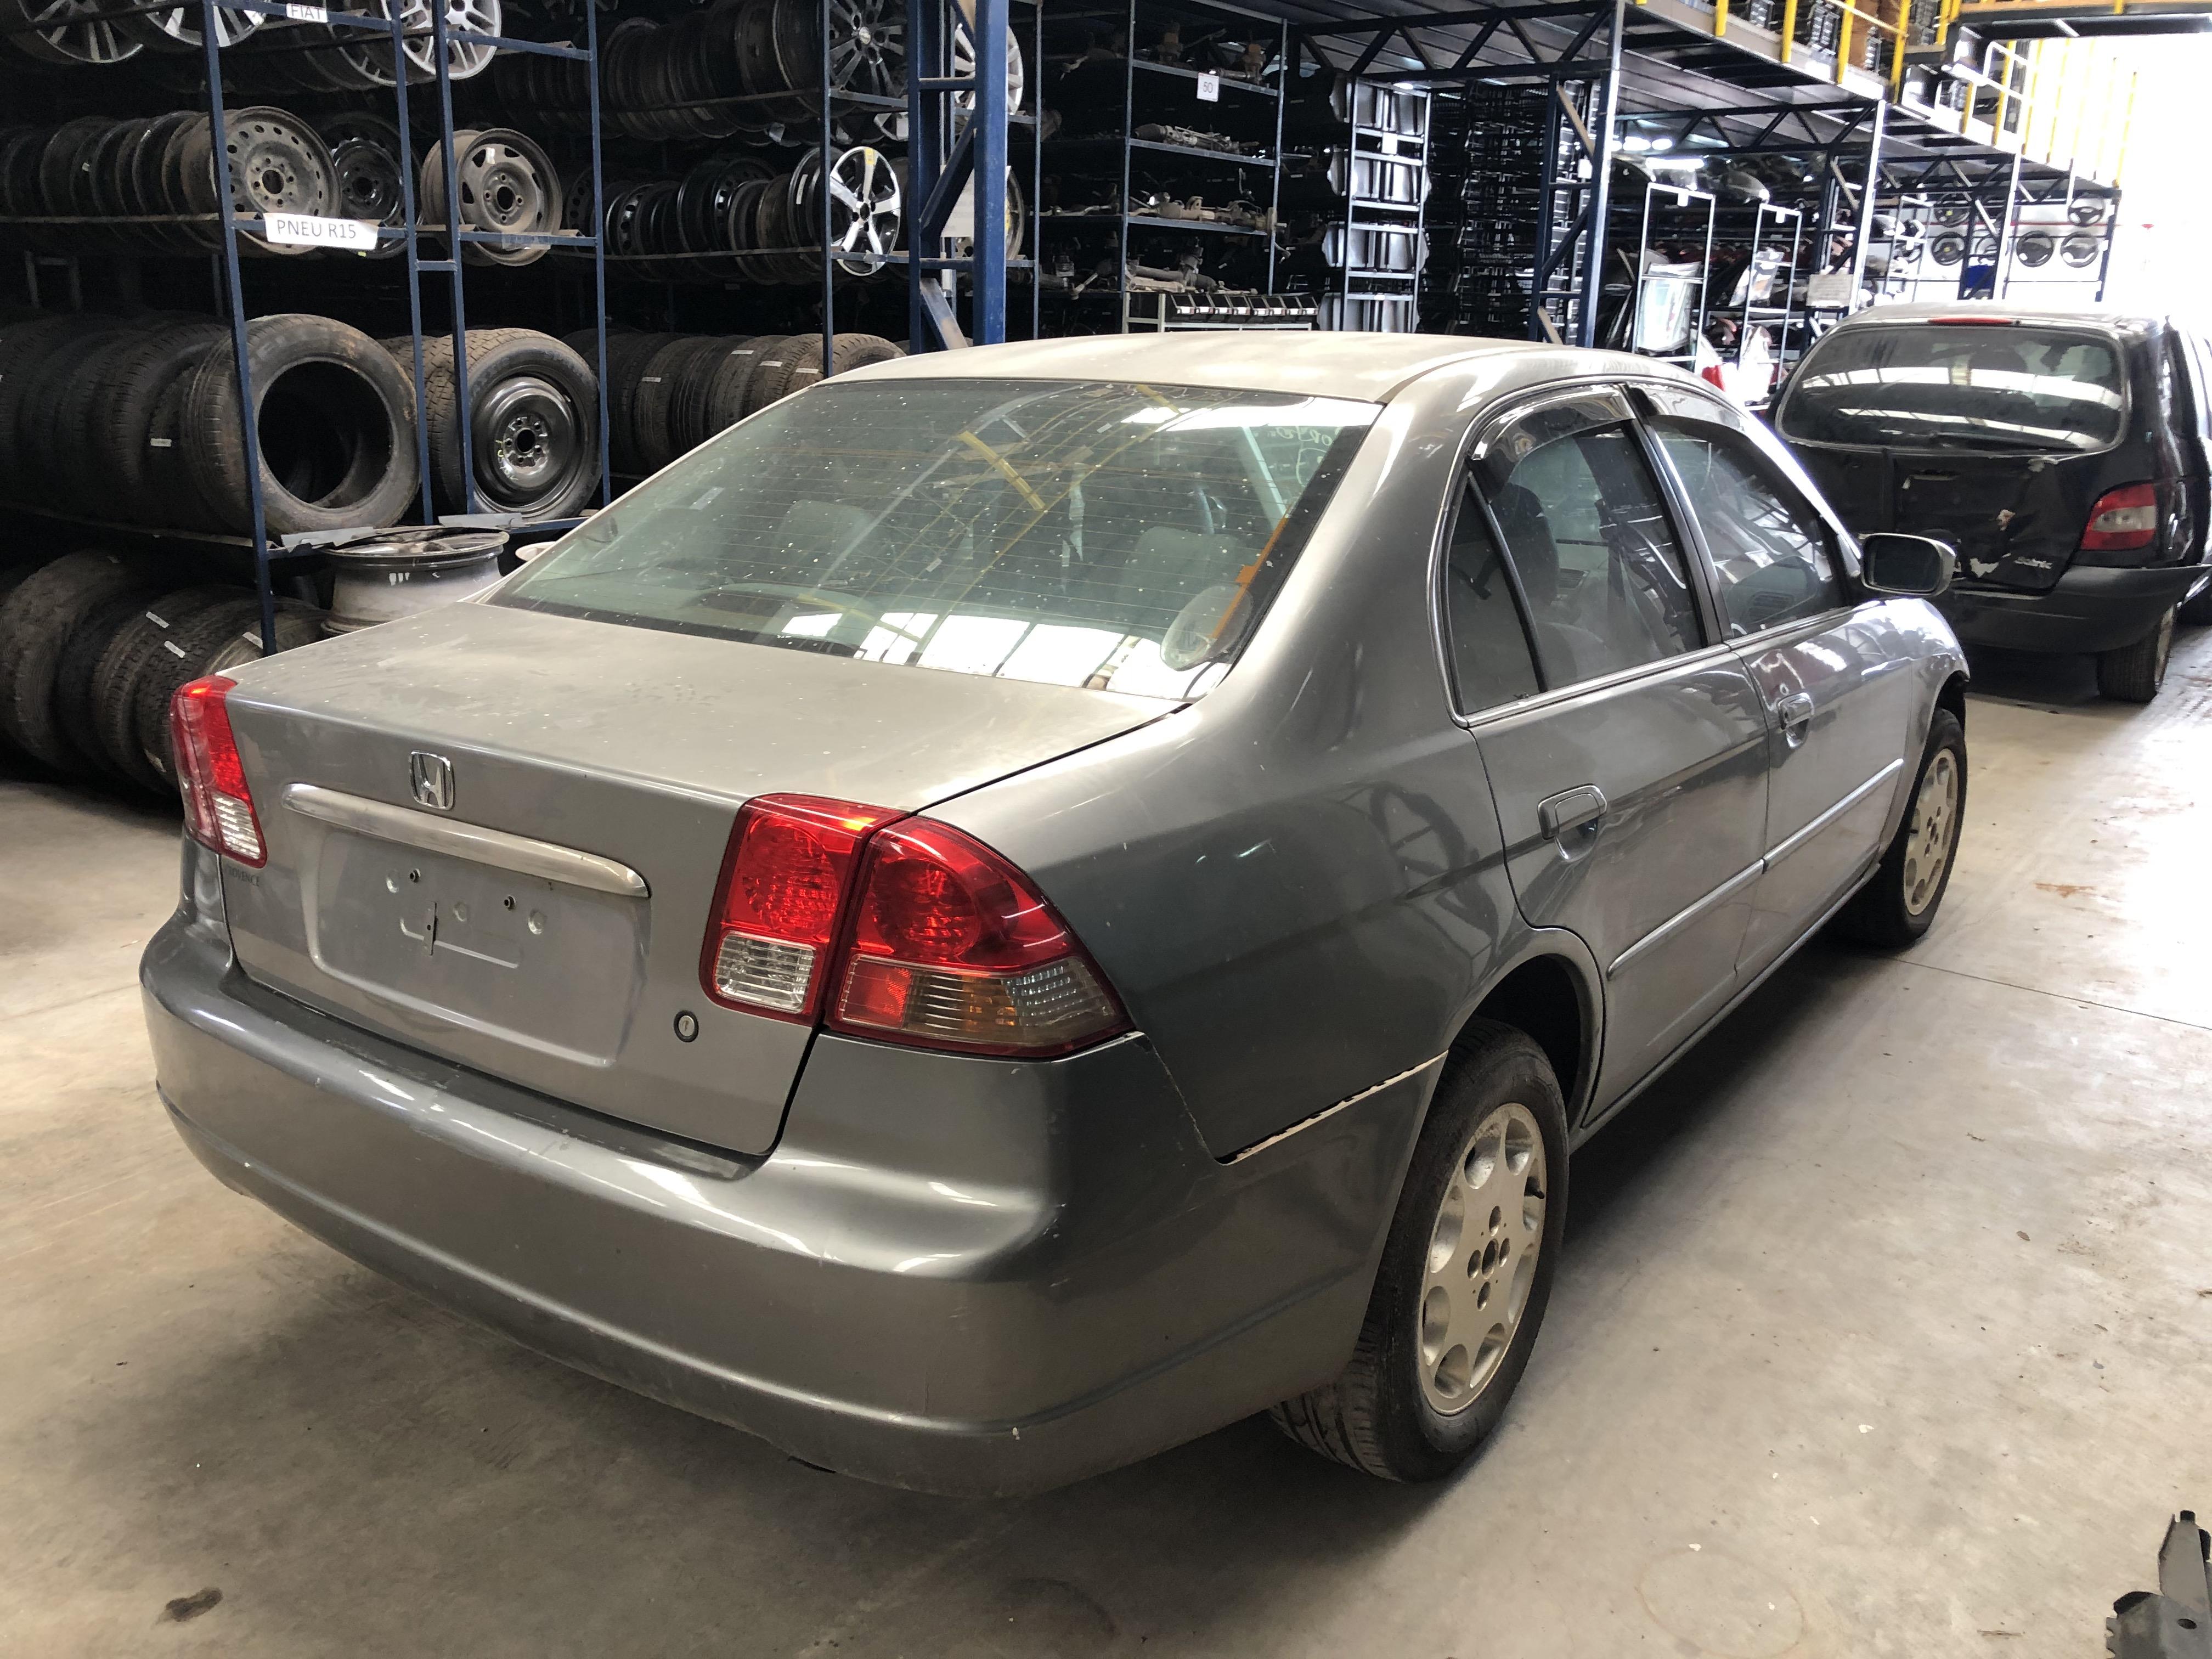 670 - Civic - 2